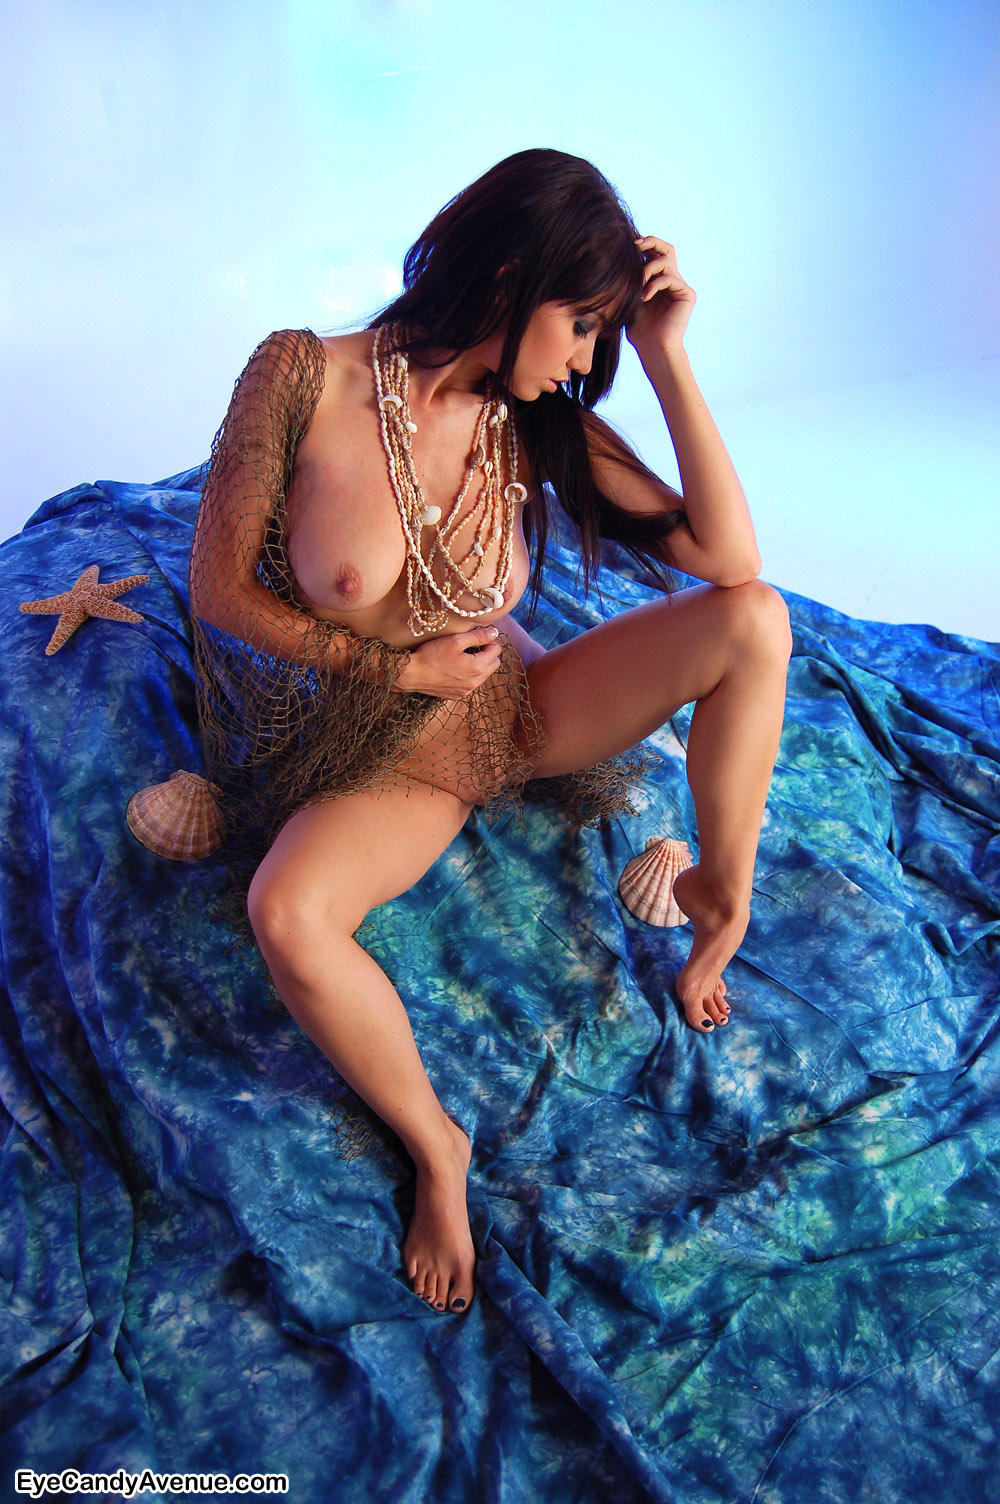 Dakota nackt Kelsea  Dolly Parton